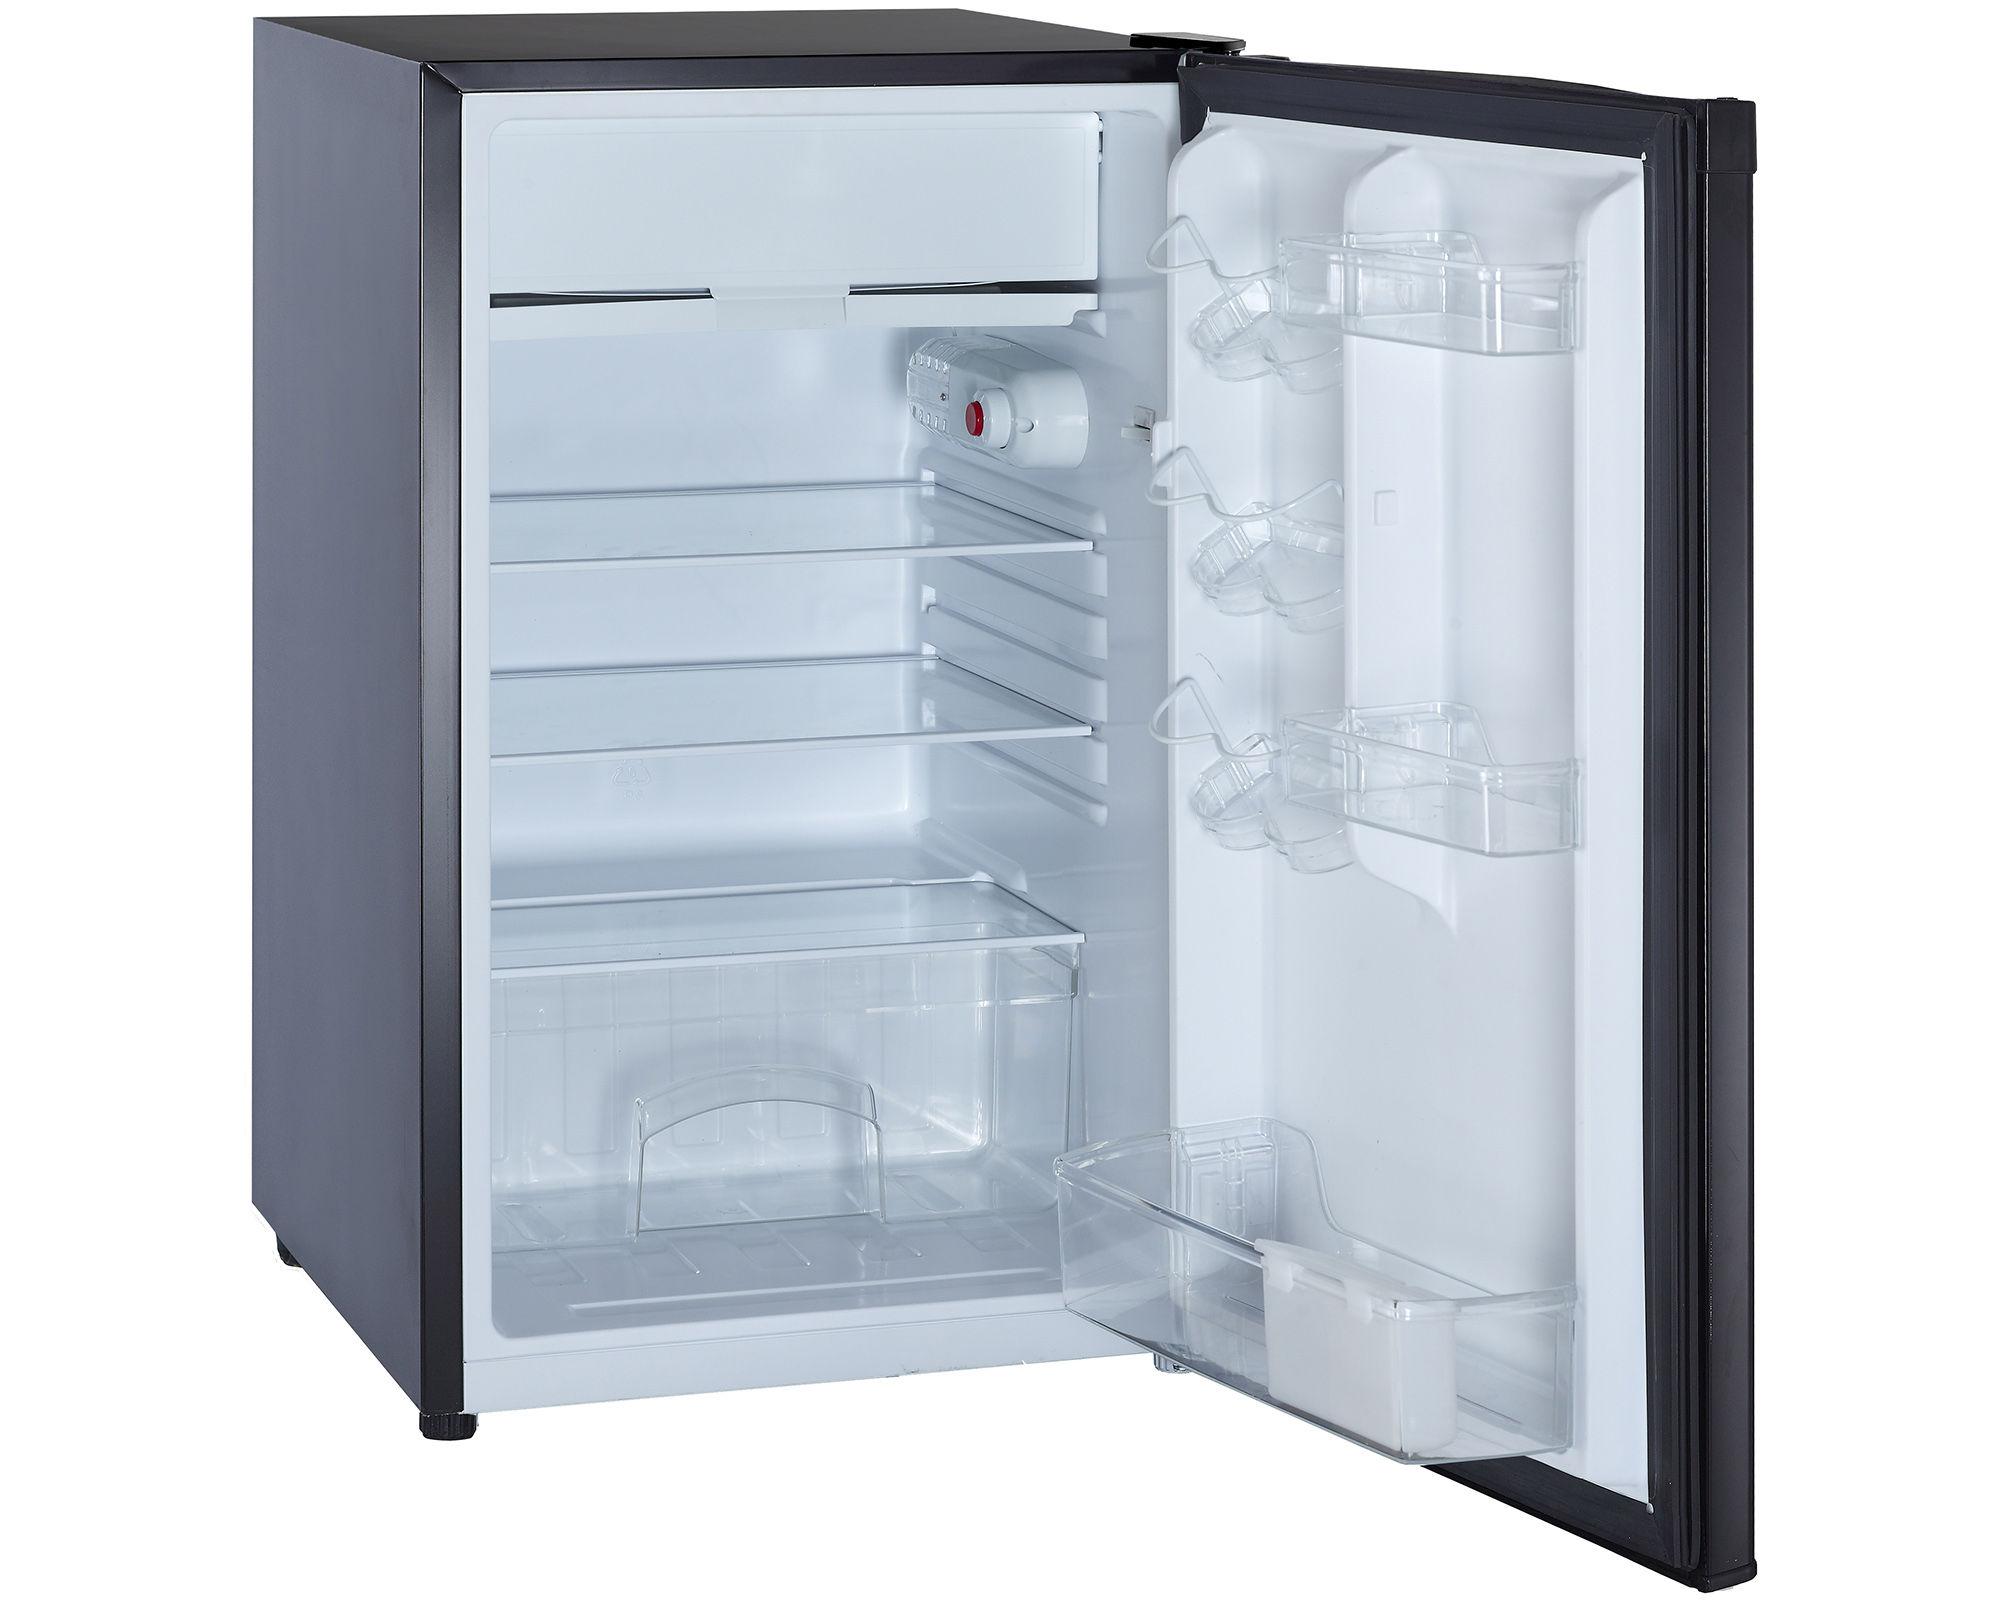 Upc 665679005604 Magic Chef 4 4 Cu Ft Refrigerator